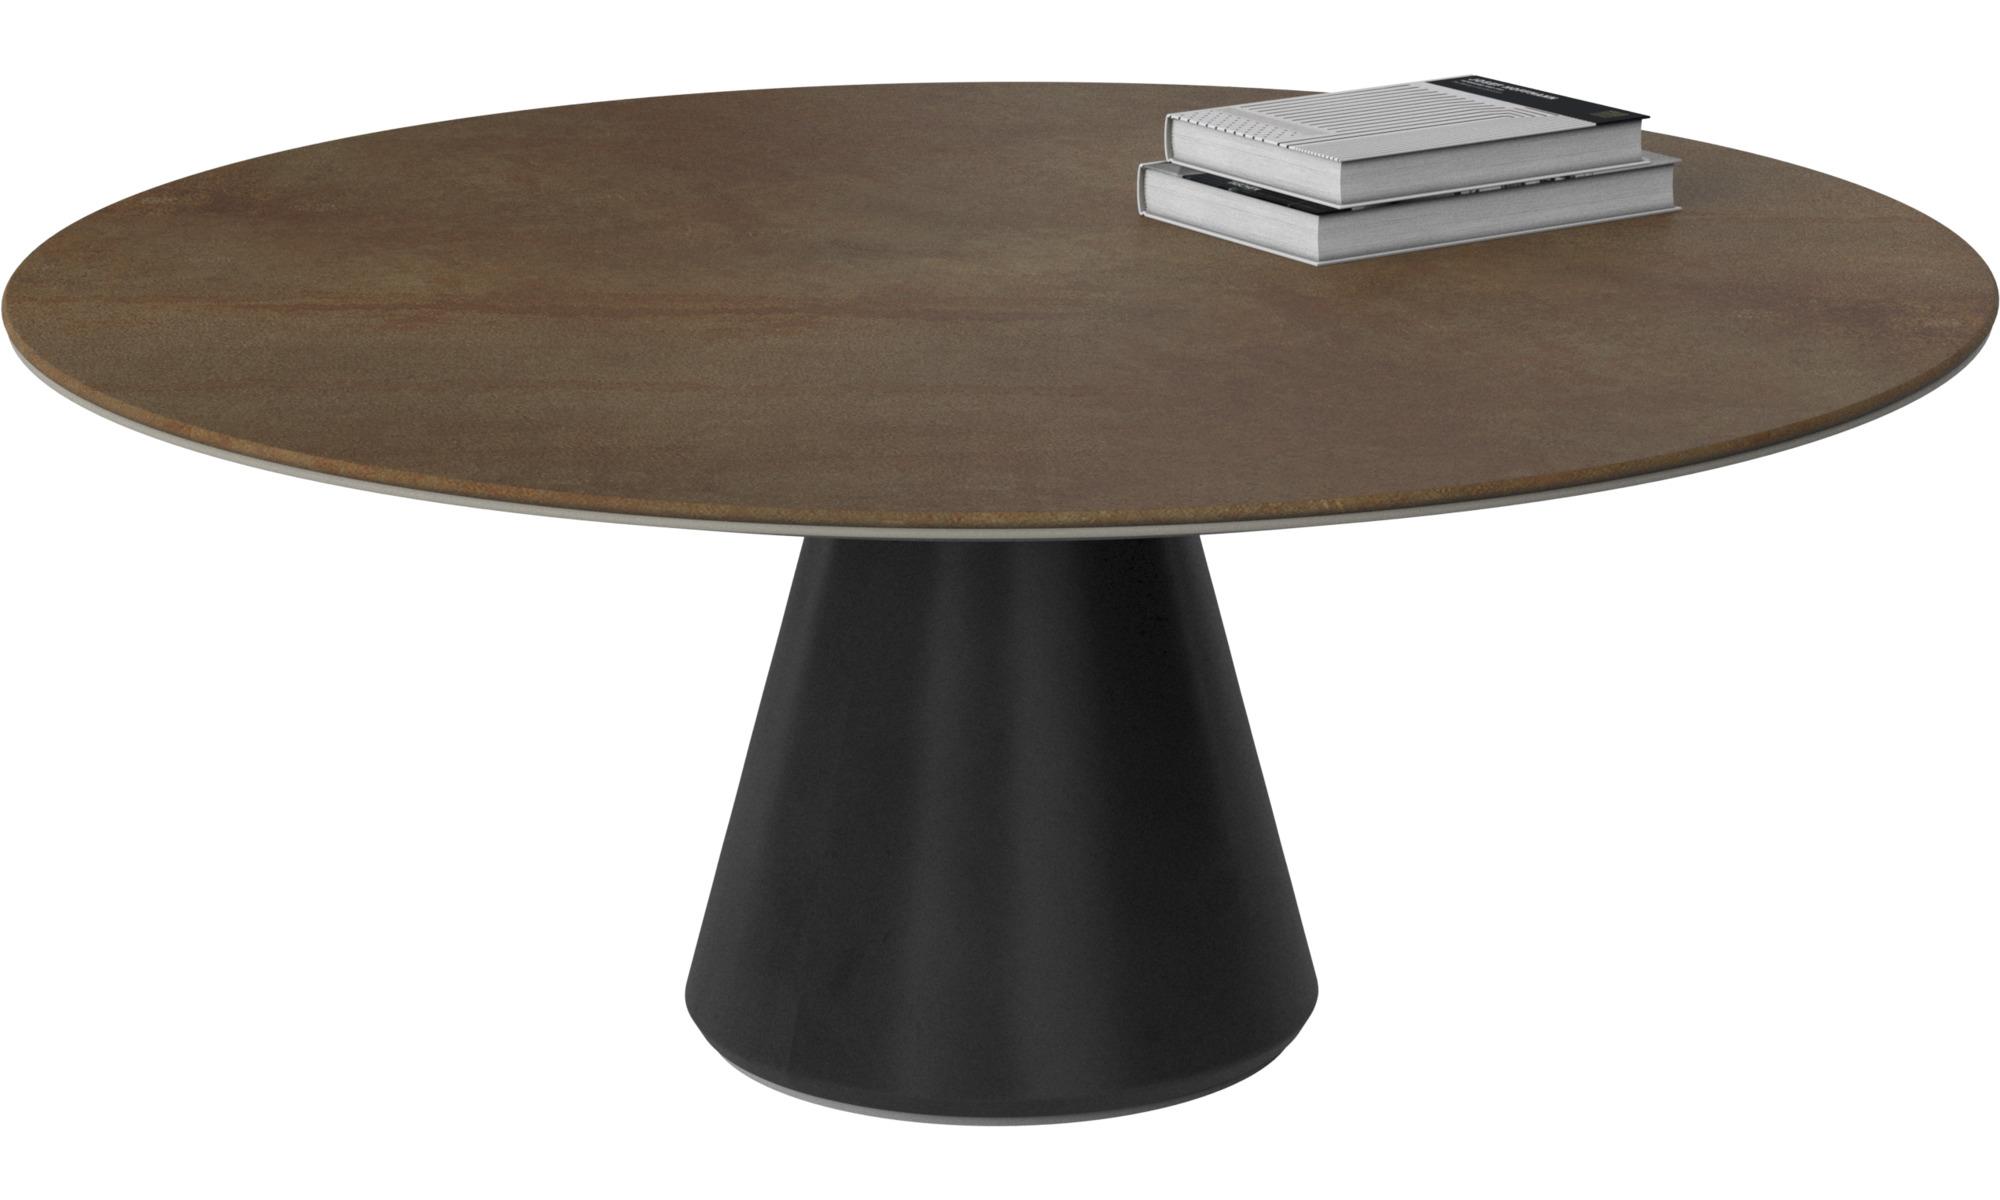 Tables basses table basse madrid boconcept - Bo concept table basse ...